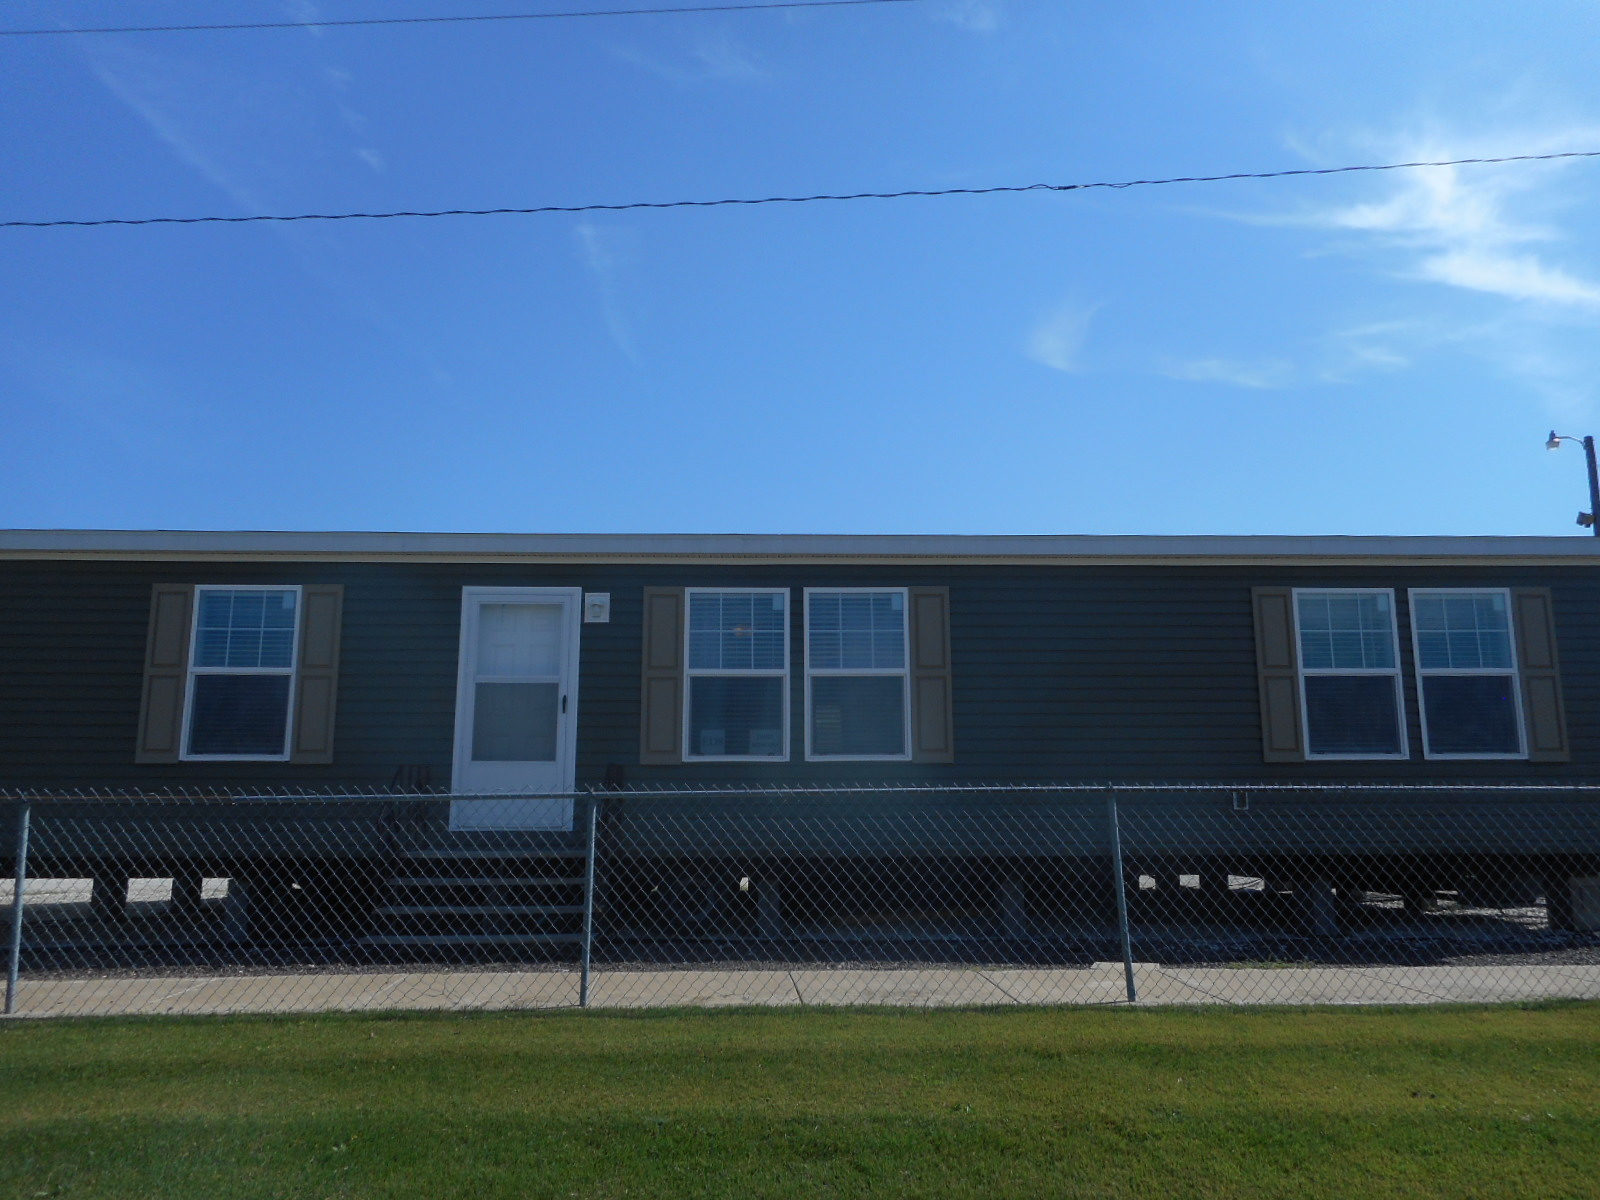 Mobile Homes | Missouri | Ramsey Jones Homes on boat models, house models, investment models, comet models, mobile history, ar models, mobile homes from 1960, apartment models,